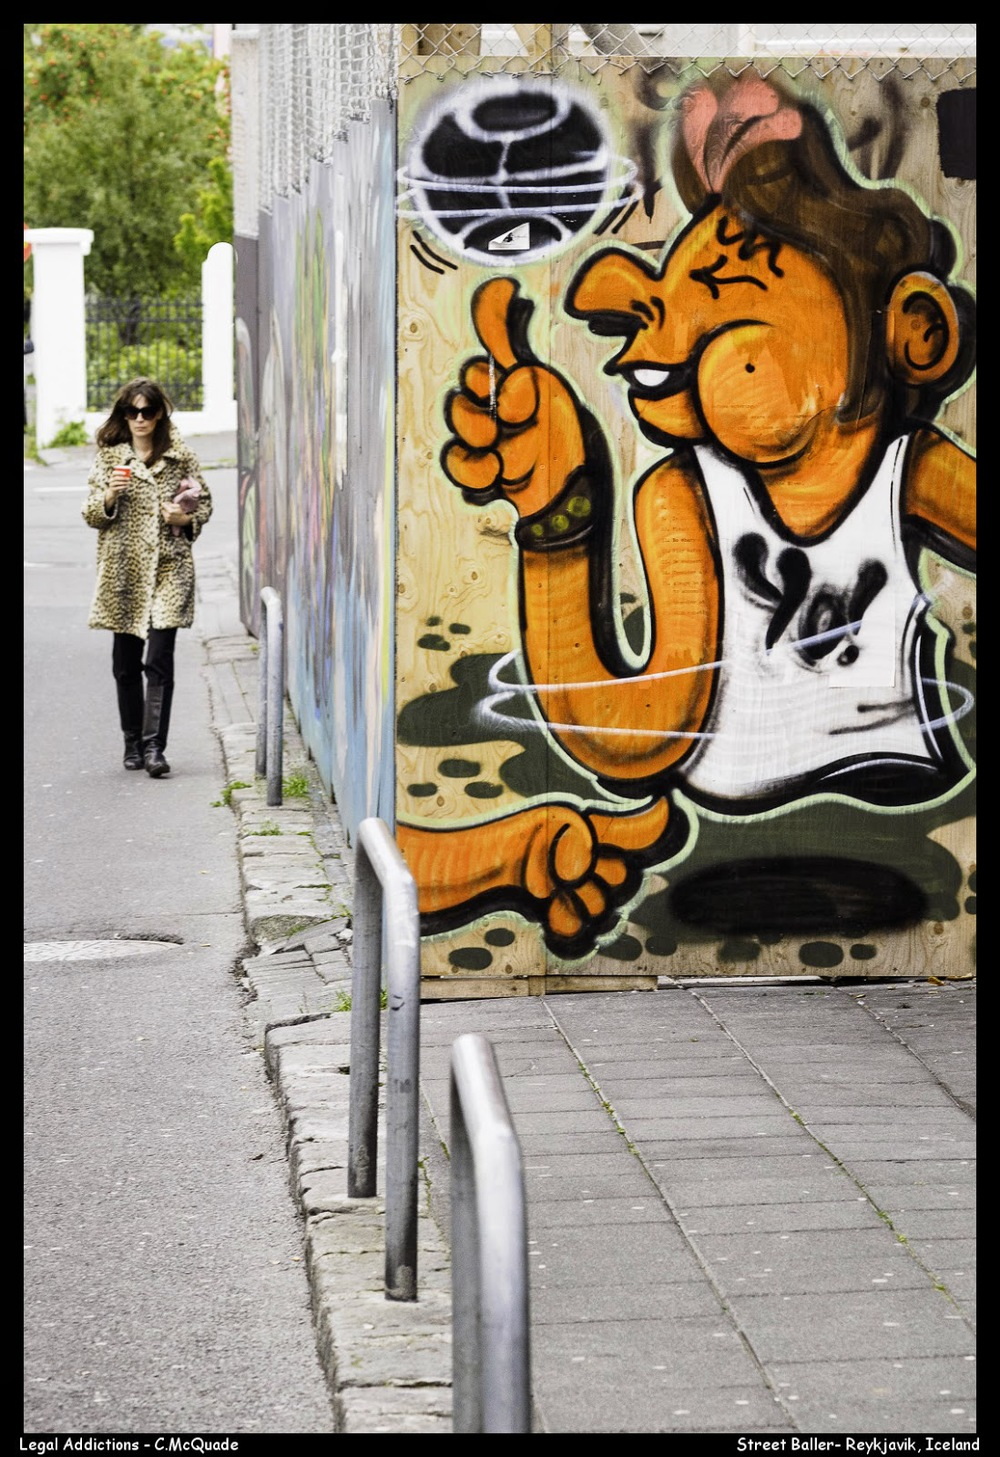 street%2Bball%2Bgraffiti-20146469.jpg